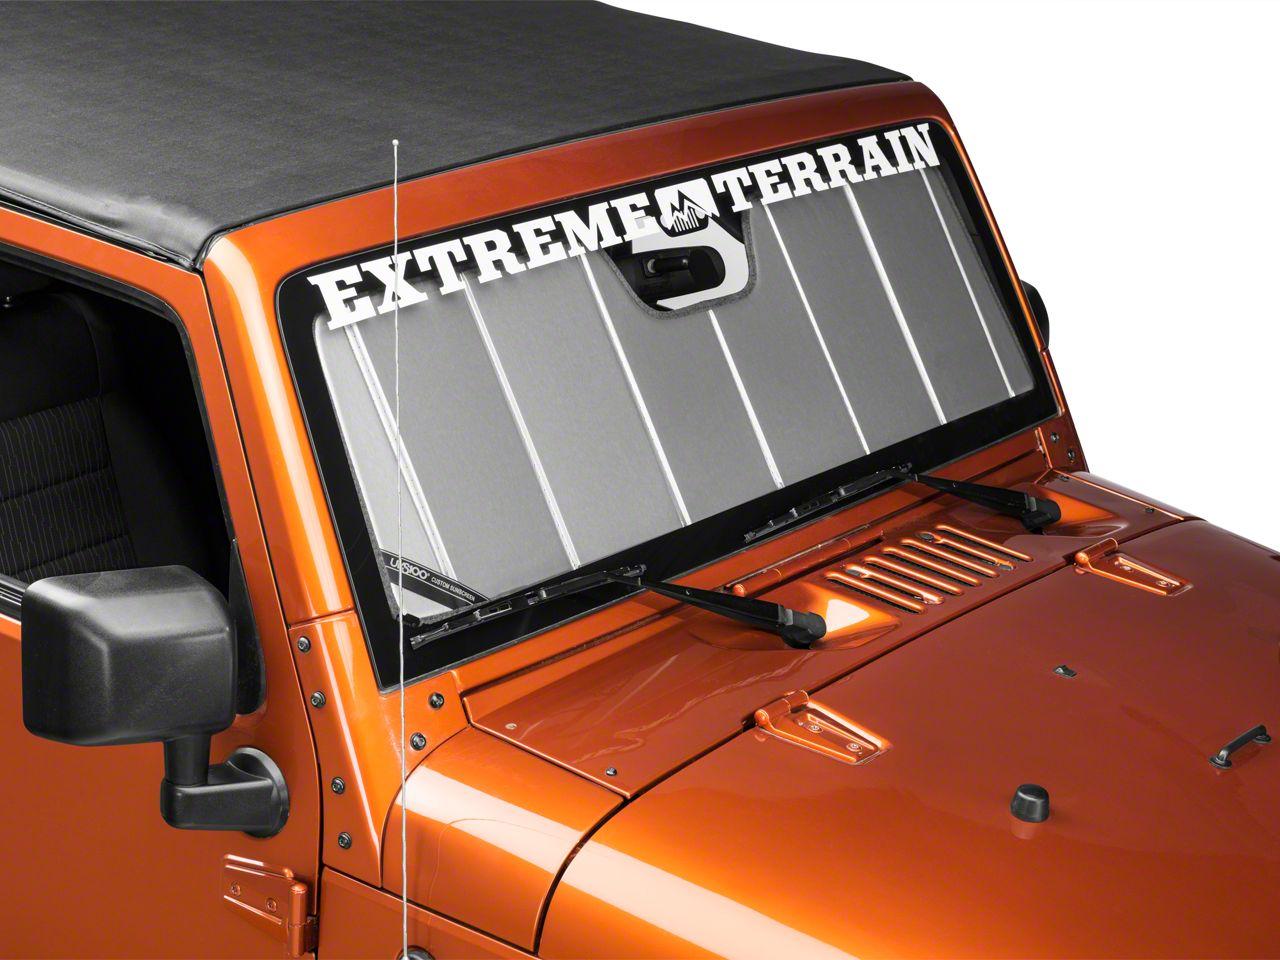 Covercraft UV10637GN Green Ice UVS 100 Custom Fit Sunscreen for Select Jeep Wrangler Models 1 Pack Laminate Material